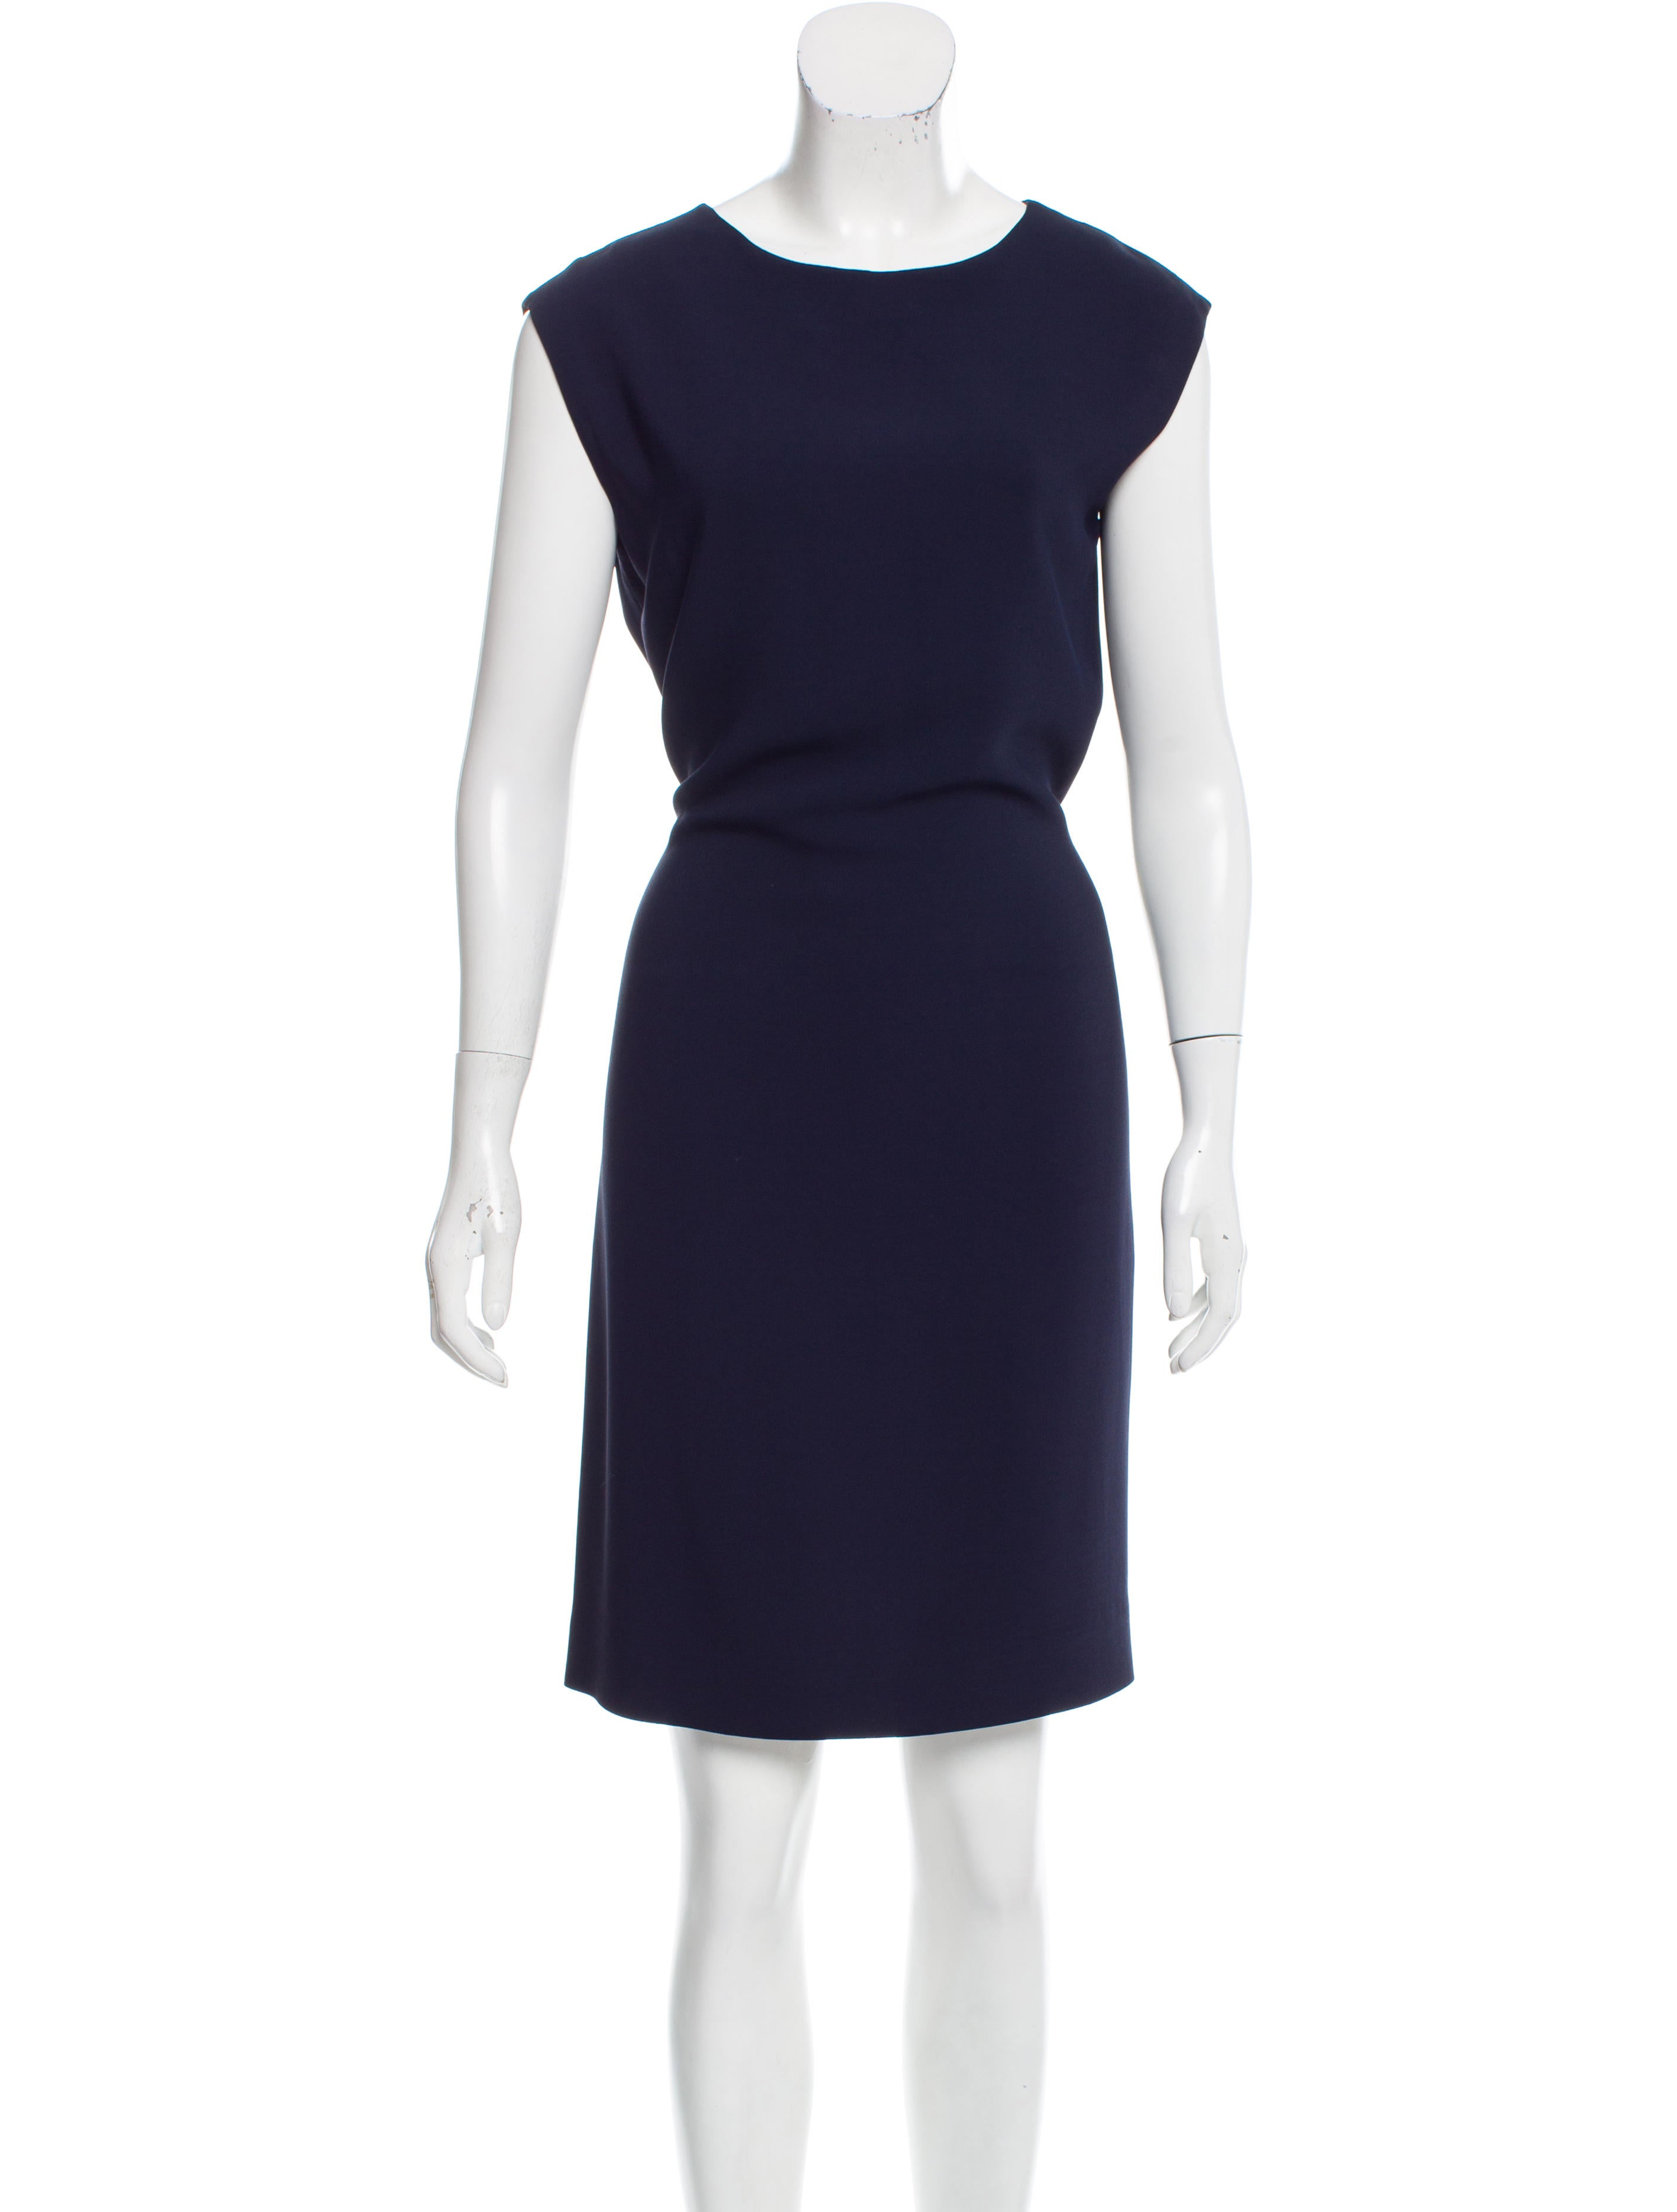 how to wear sleeveless shift dress